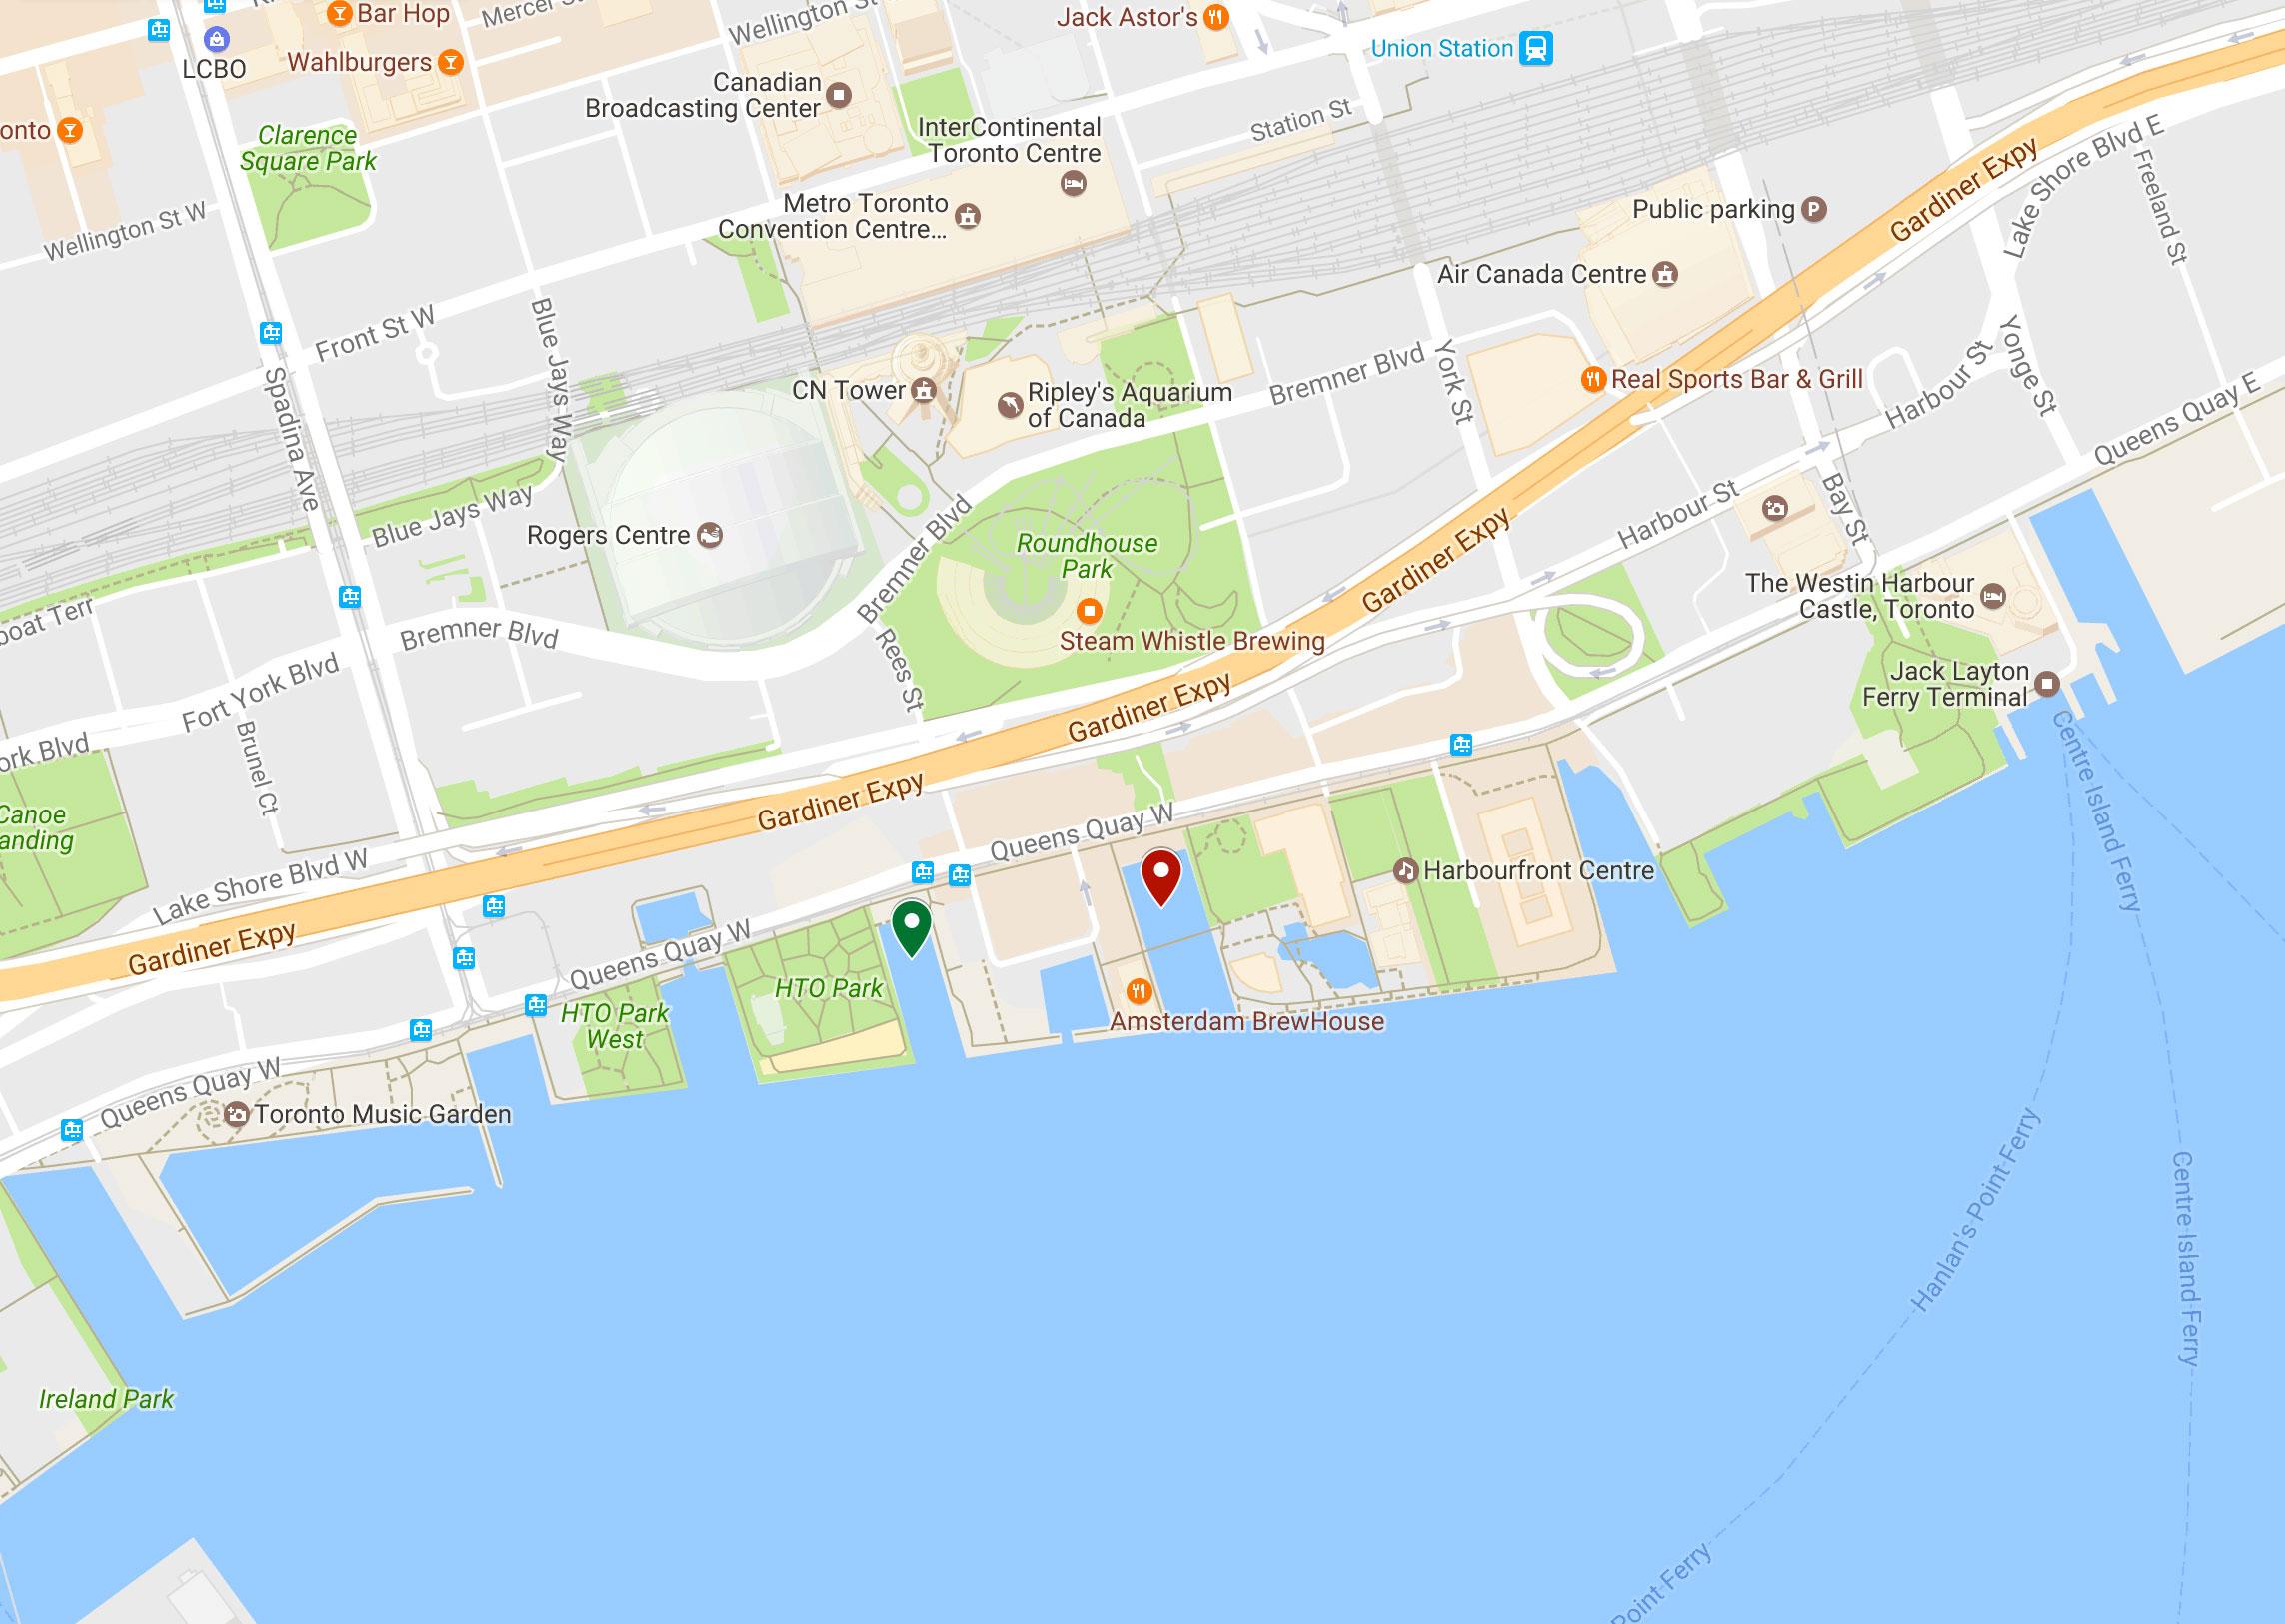 Green pin: HTO Park. Red Pin: Marina 4.